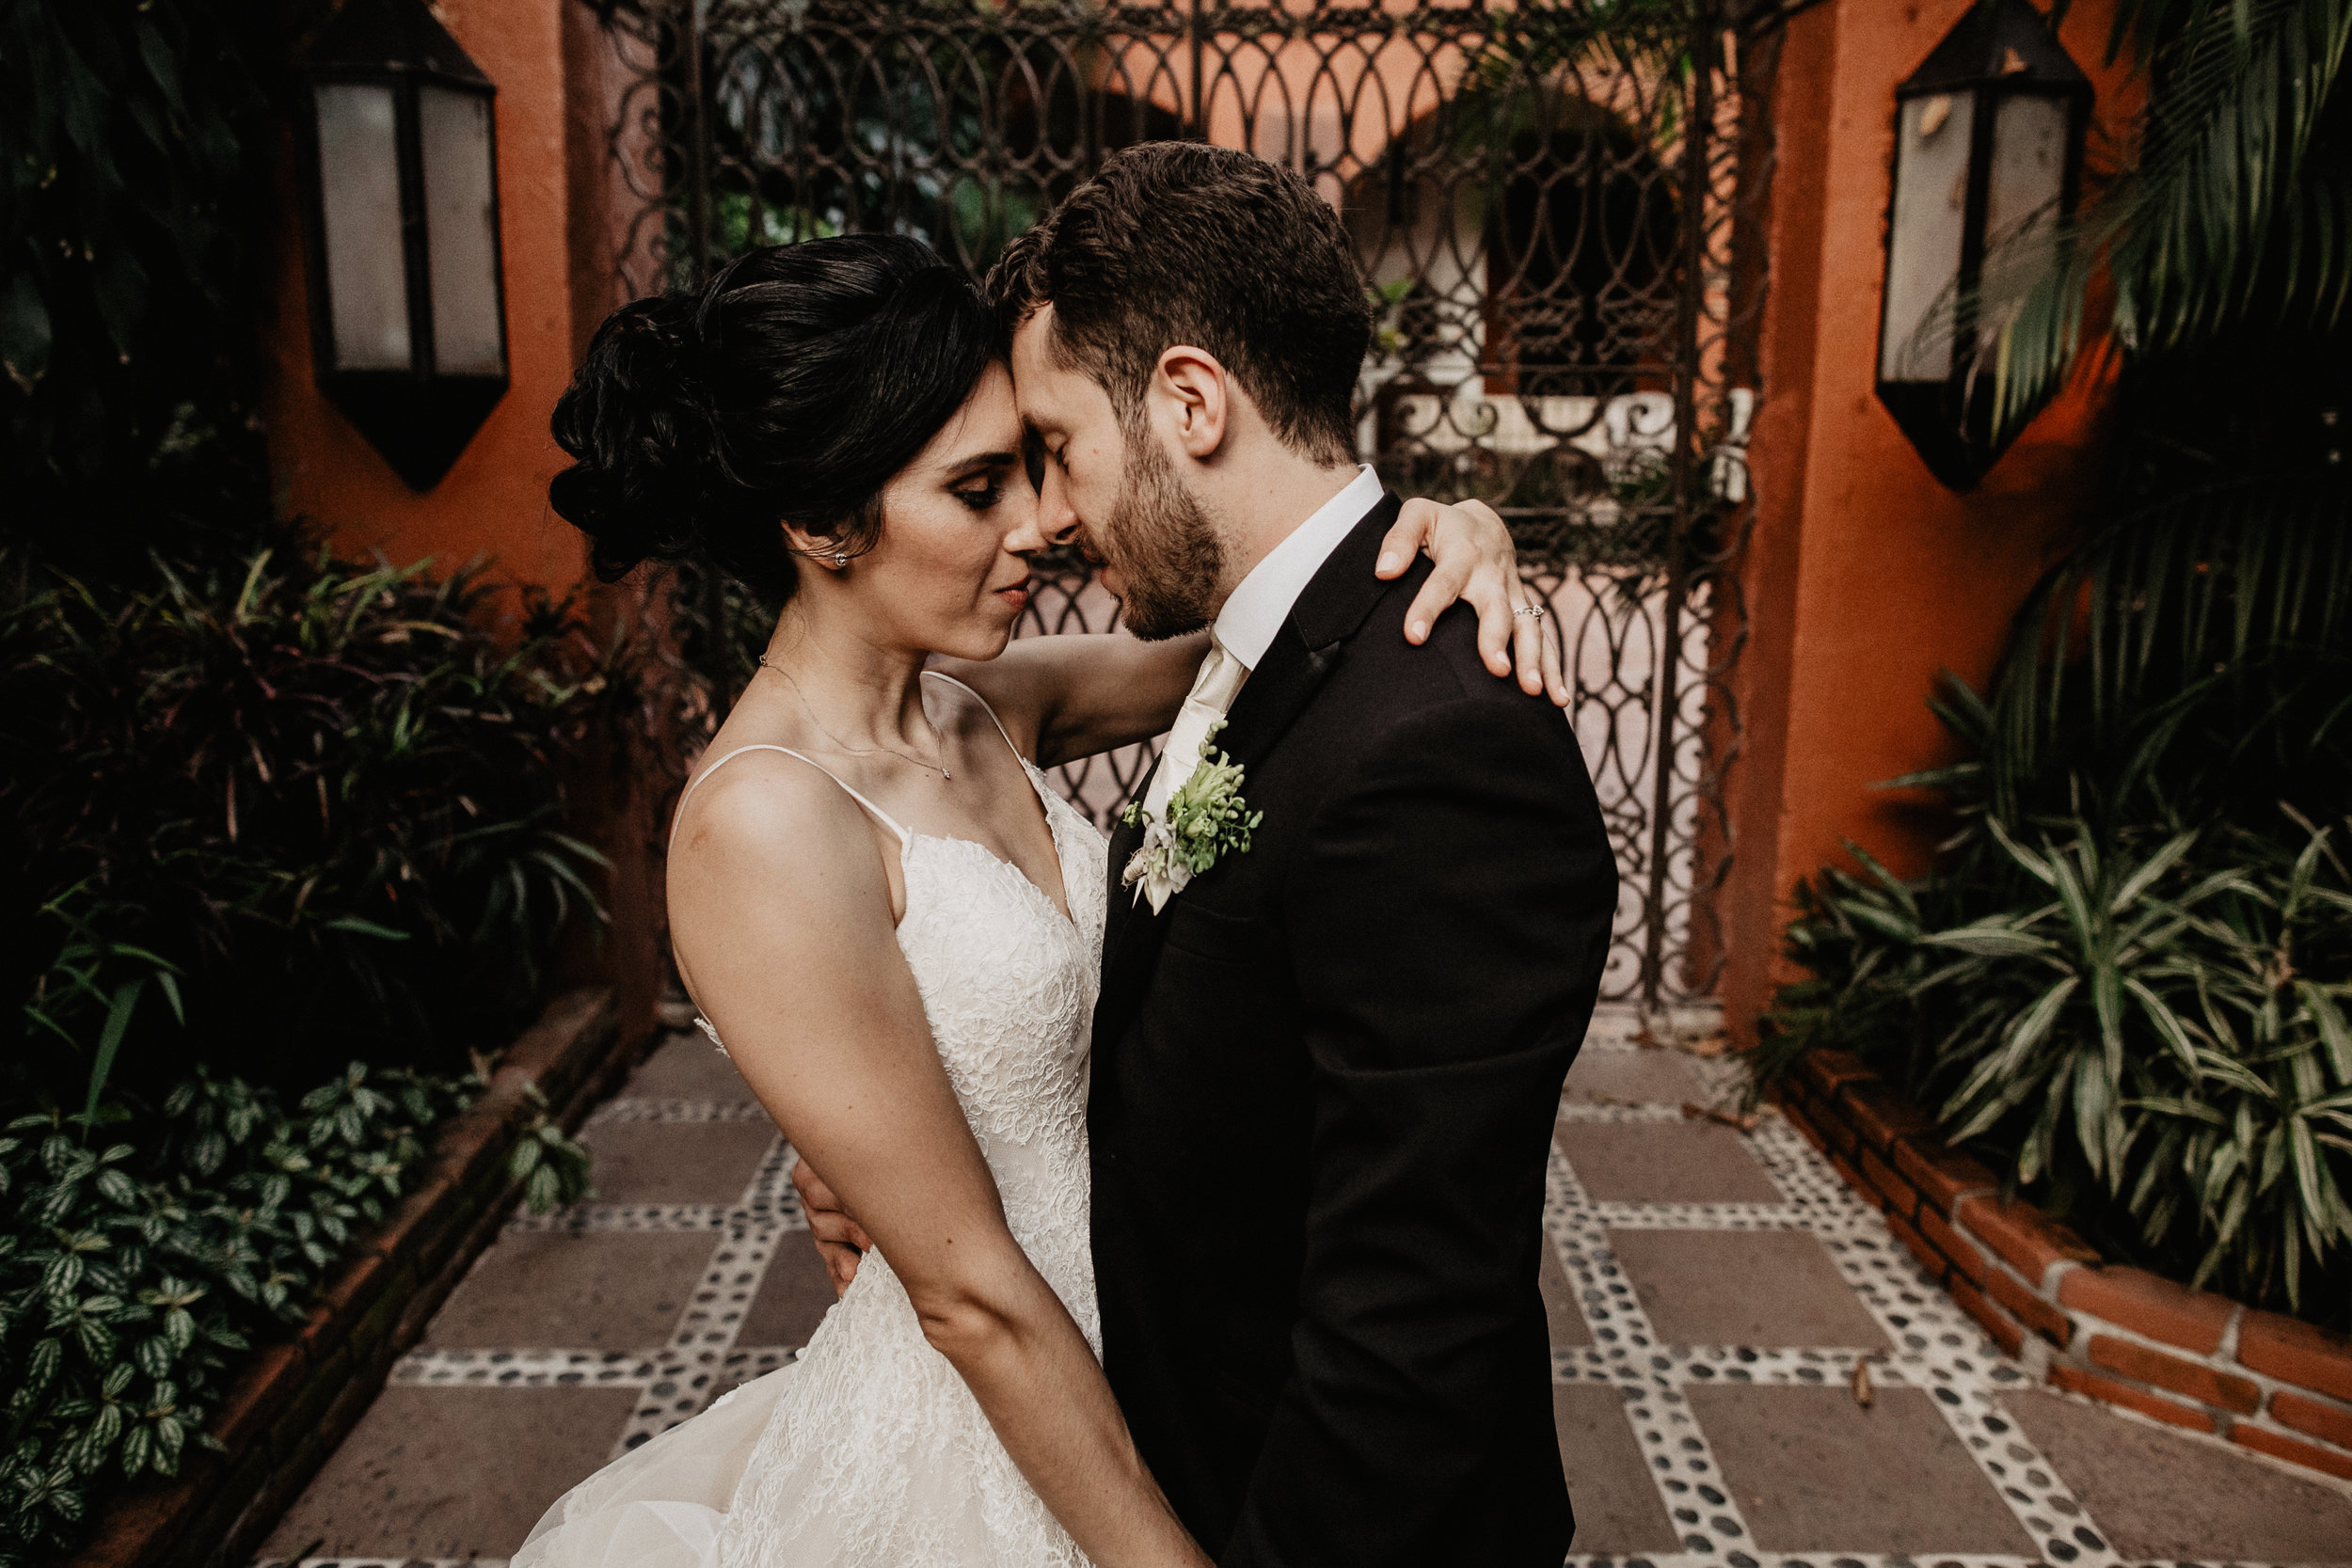 Alfonso_flores_destination_wedding_photography_vanesa_carlos-849.JPG